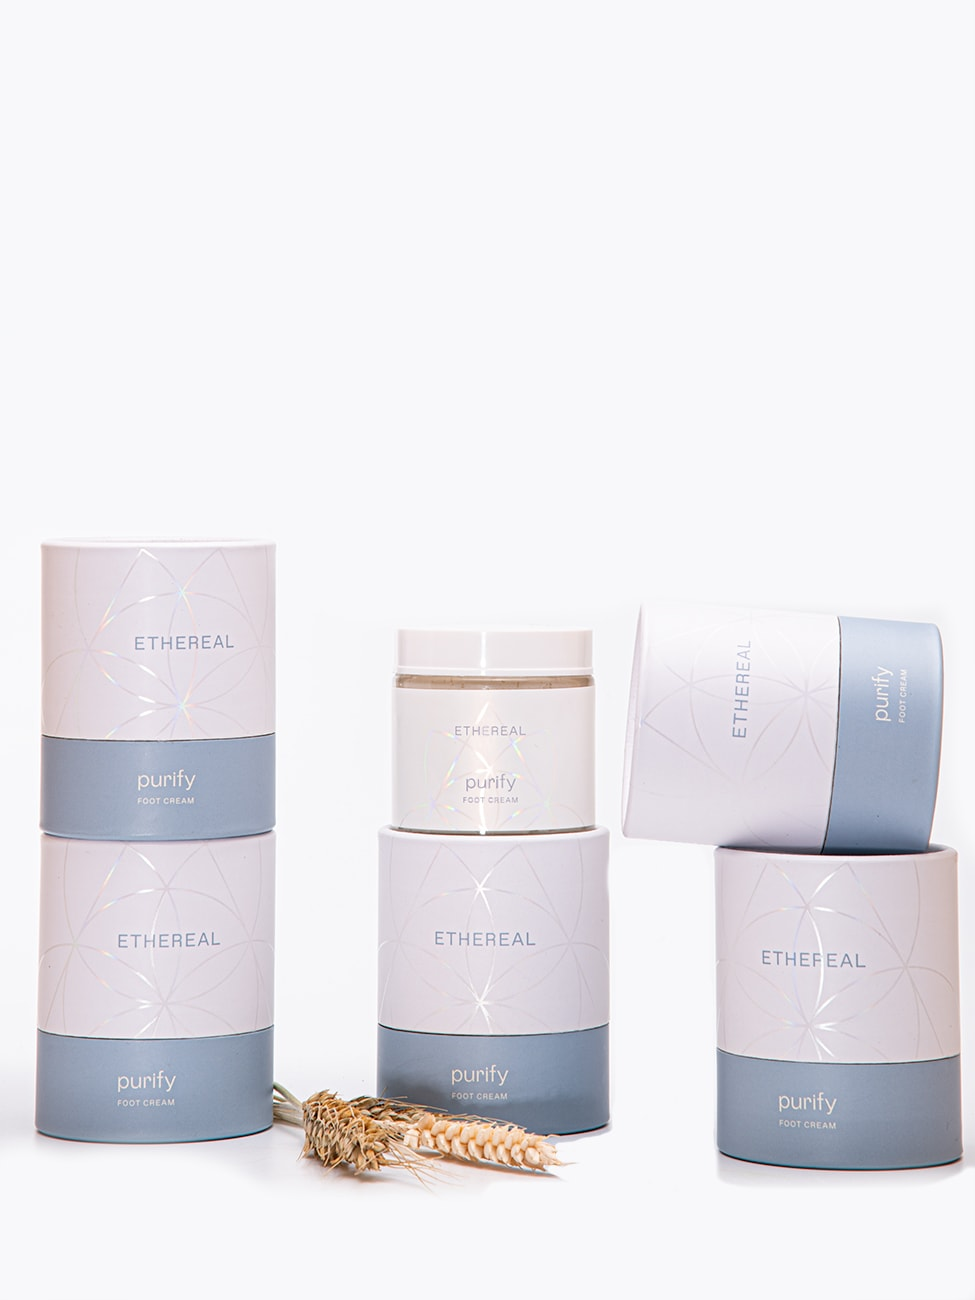 Purify_cream_comp_Ethereal_Dermocosmetics_Skincare_Handmade_Greek_Products